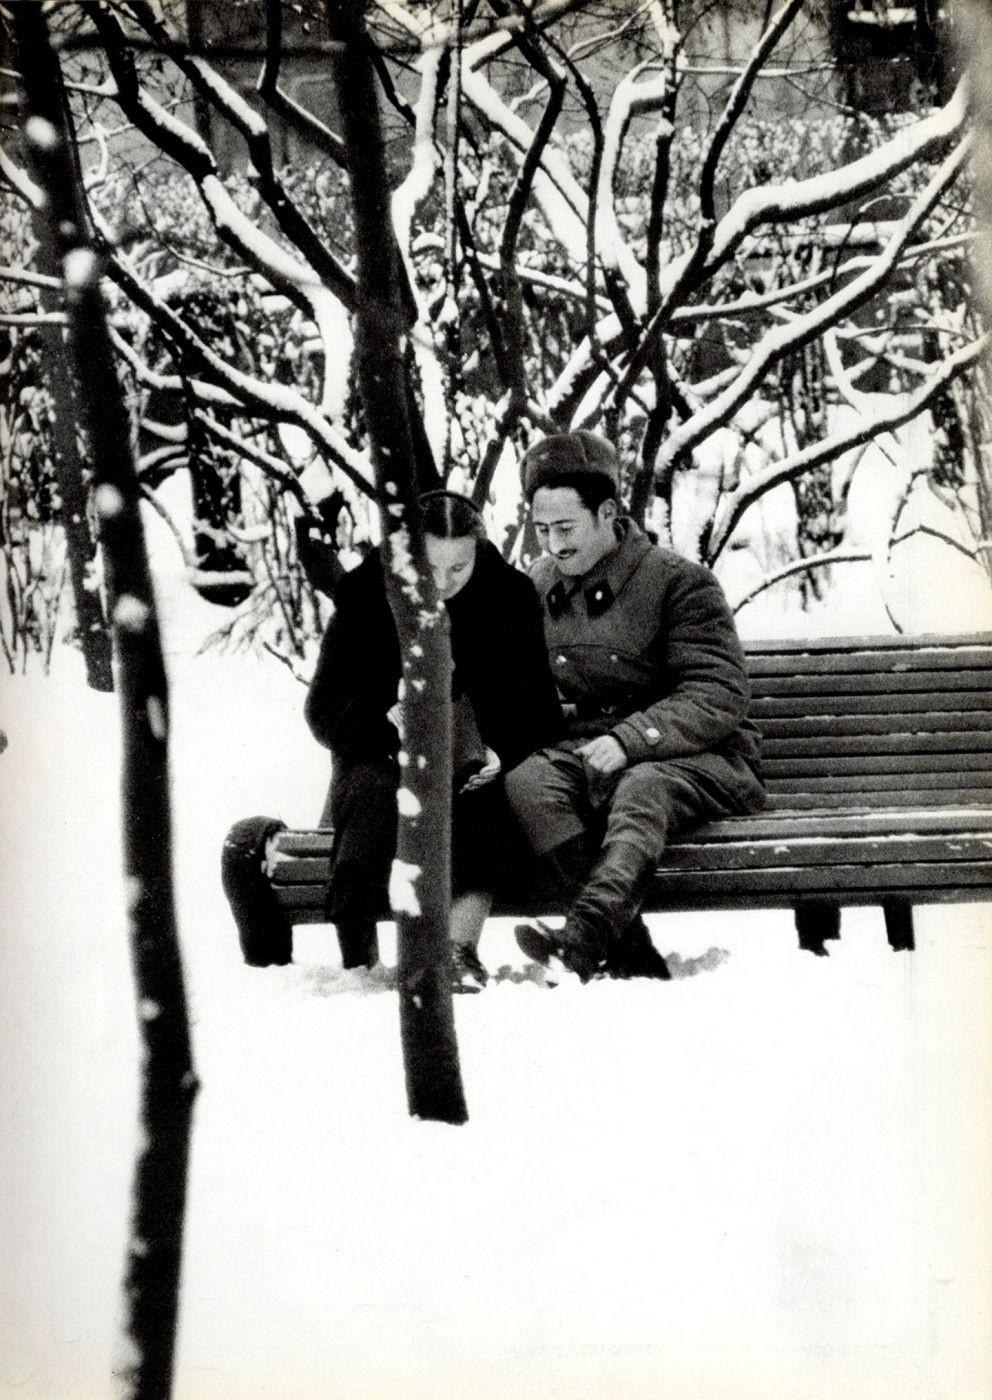 На скамейке, Москва, 1959 год. Фотограф Уильям Кляйн